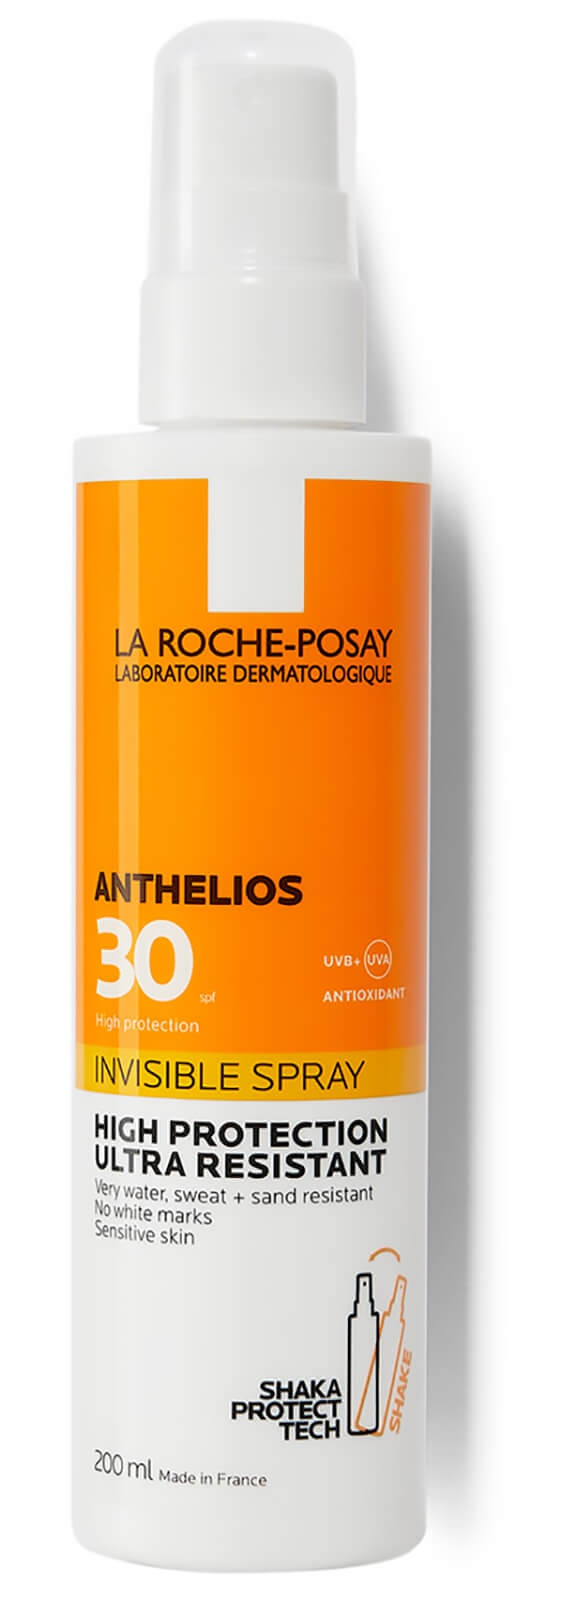 La Roche-Posay Anthelios Invisible Sun Protection Spray SPF 30